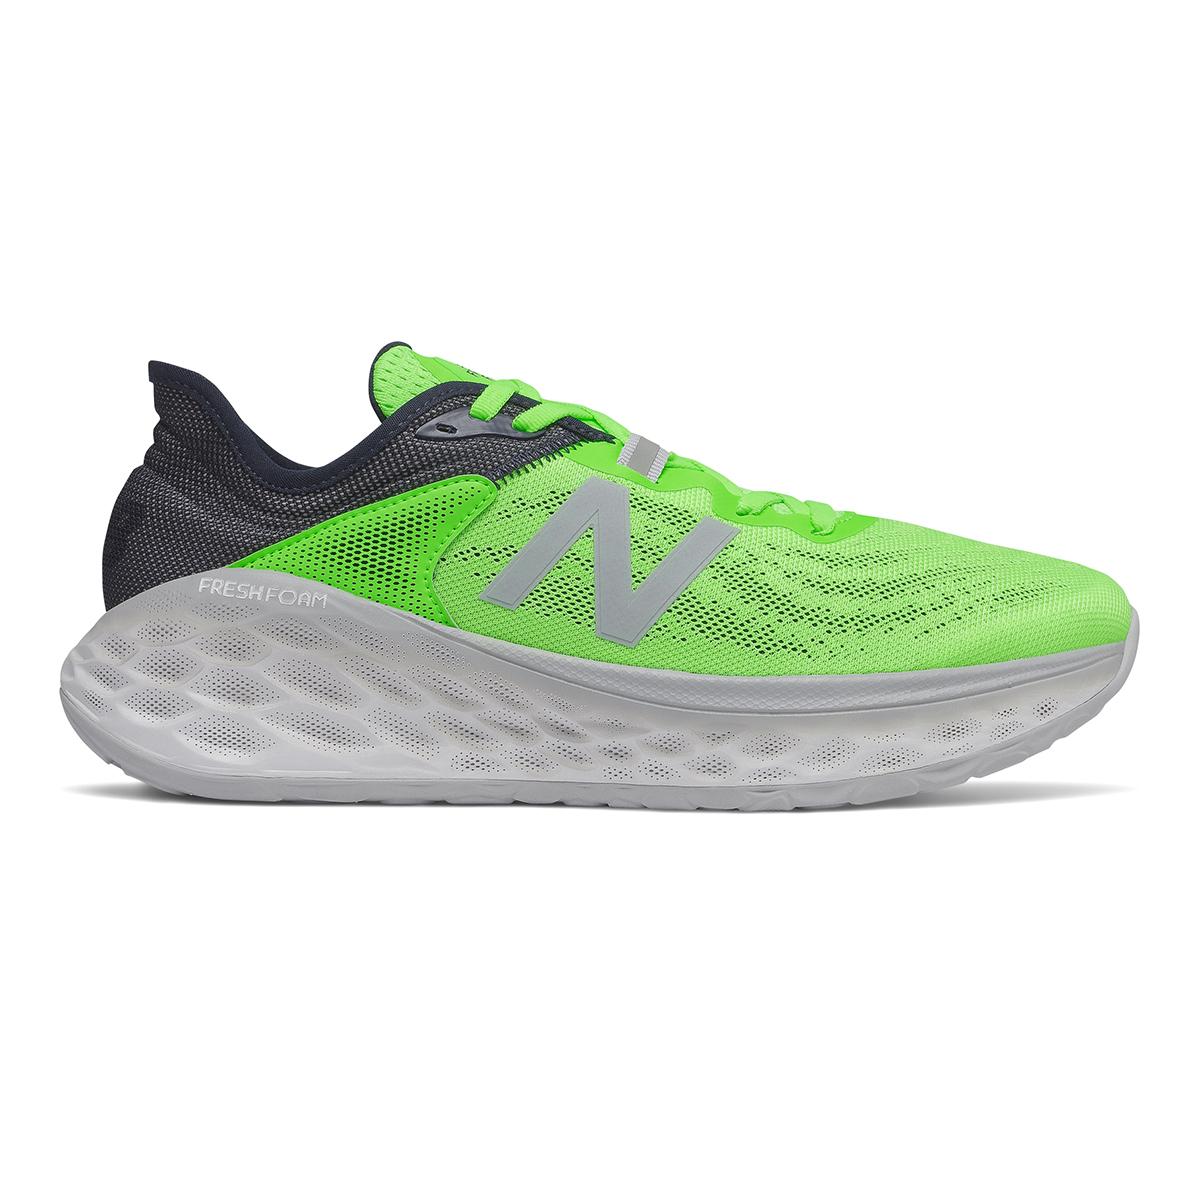 Men's New Balance Fresh Foam More V2 Running Shoe - Color: Energy Lime - Size: 7 - Width: Wide, Energy Lime, large, image 1